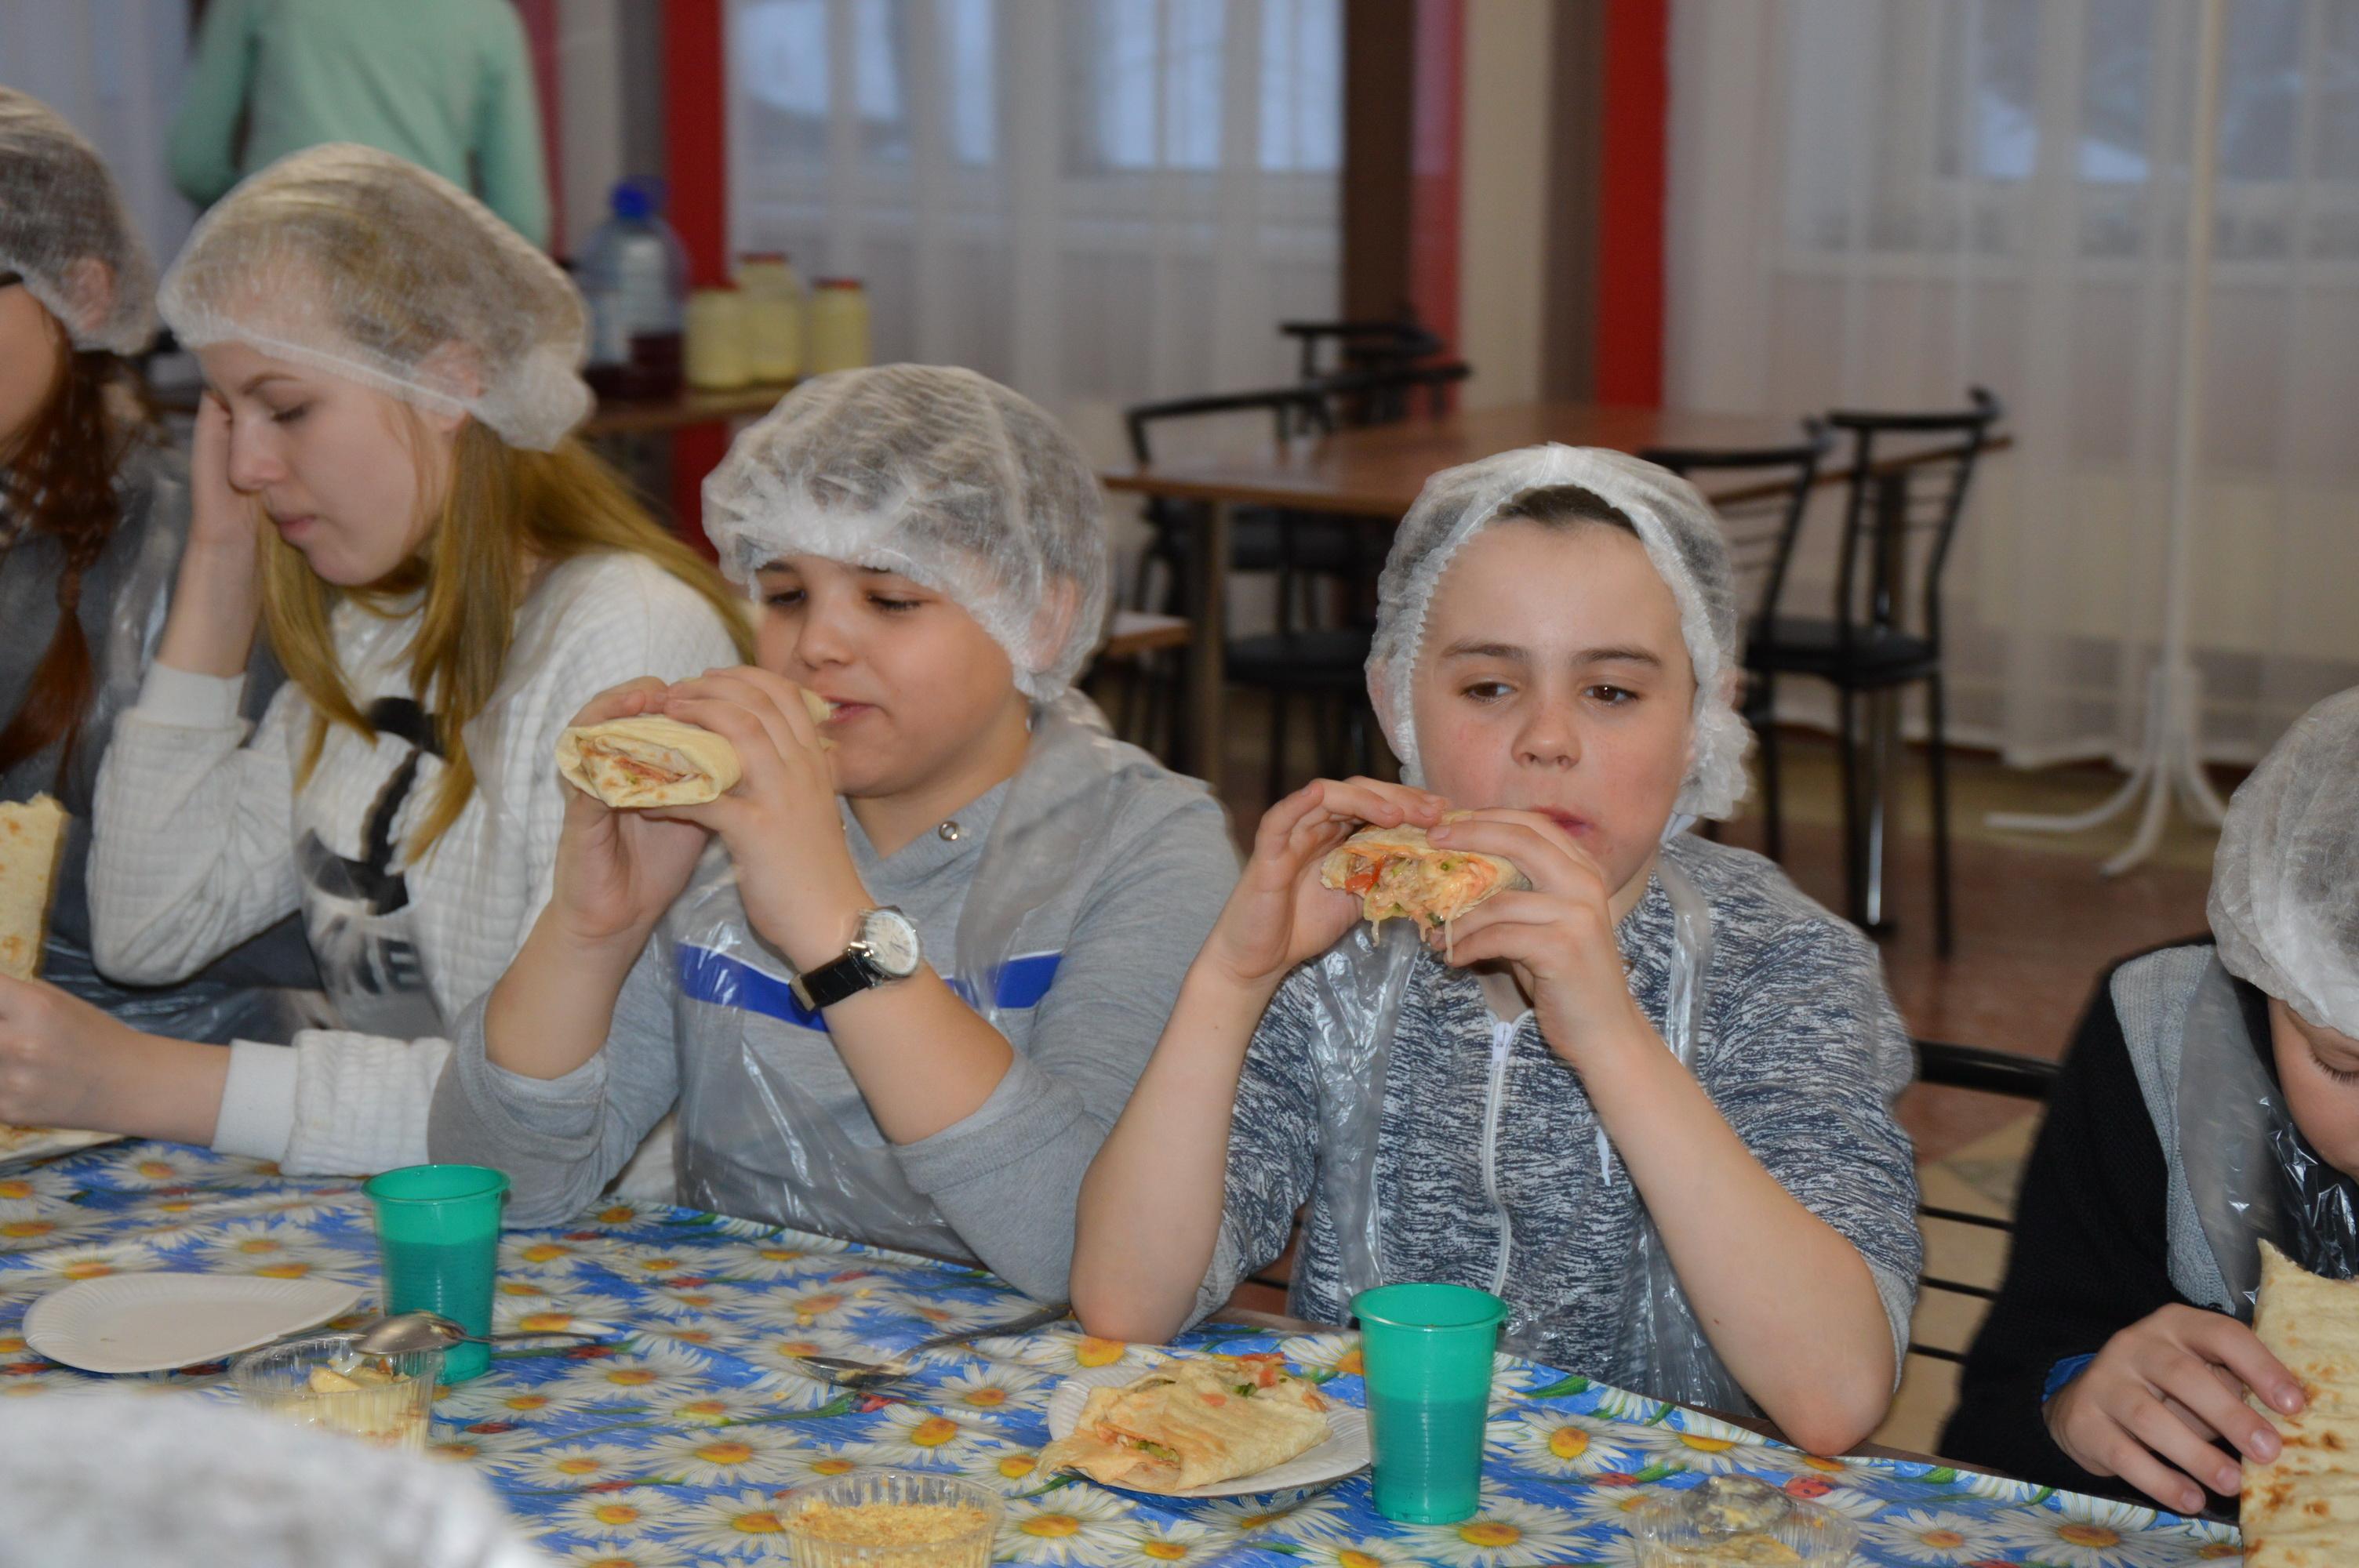 View the embedded image gallery online at: http://presststuru/indexphp/item/704-ekskursii-dlya-studentov-tgtu#